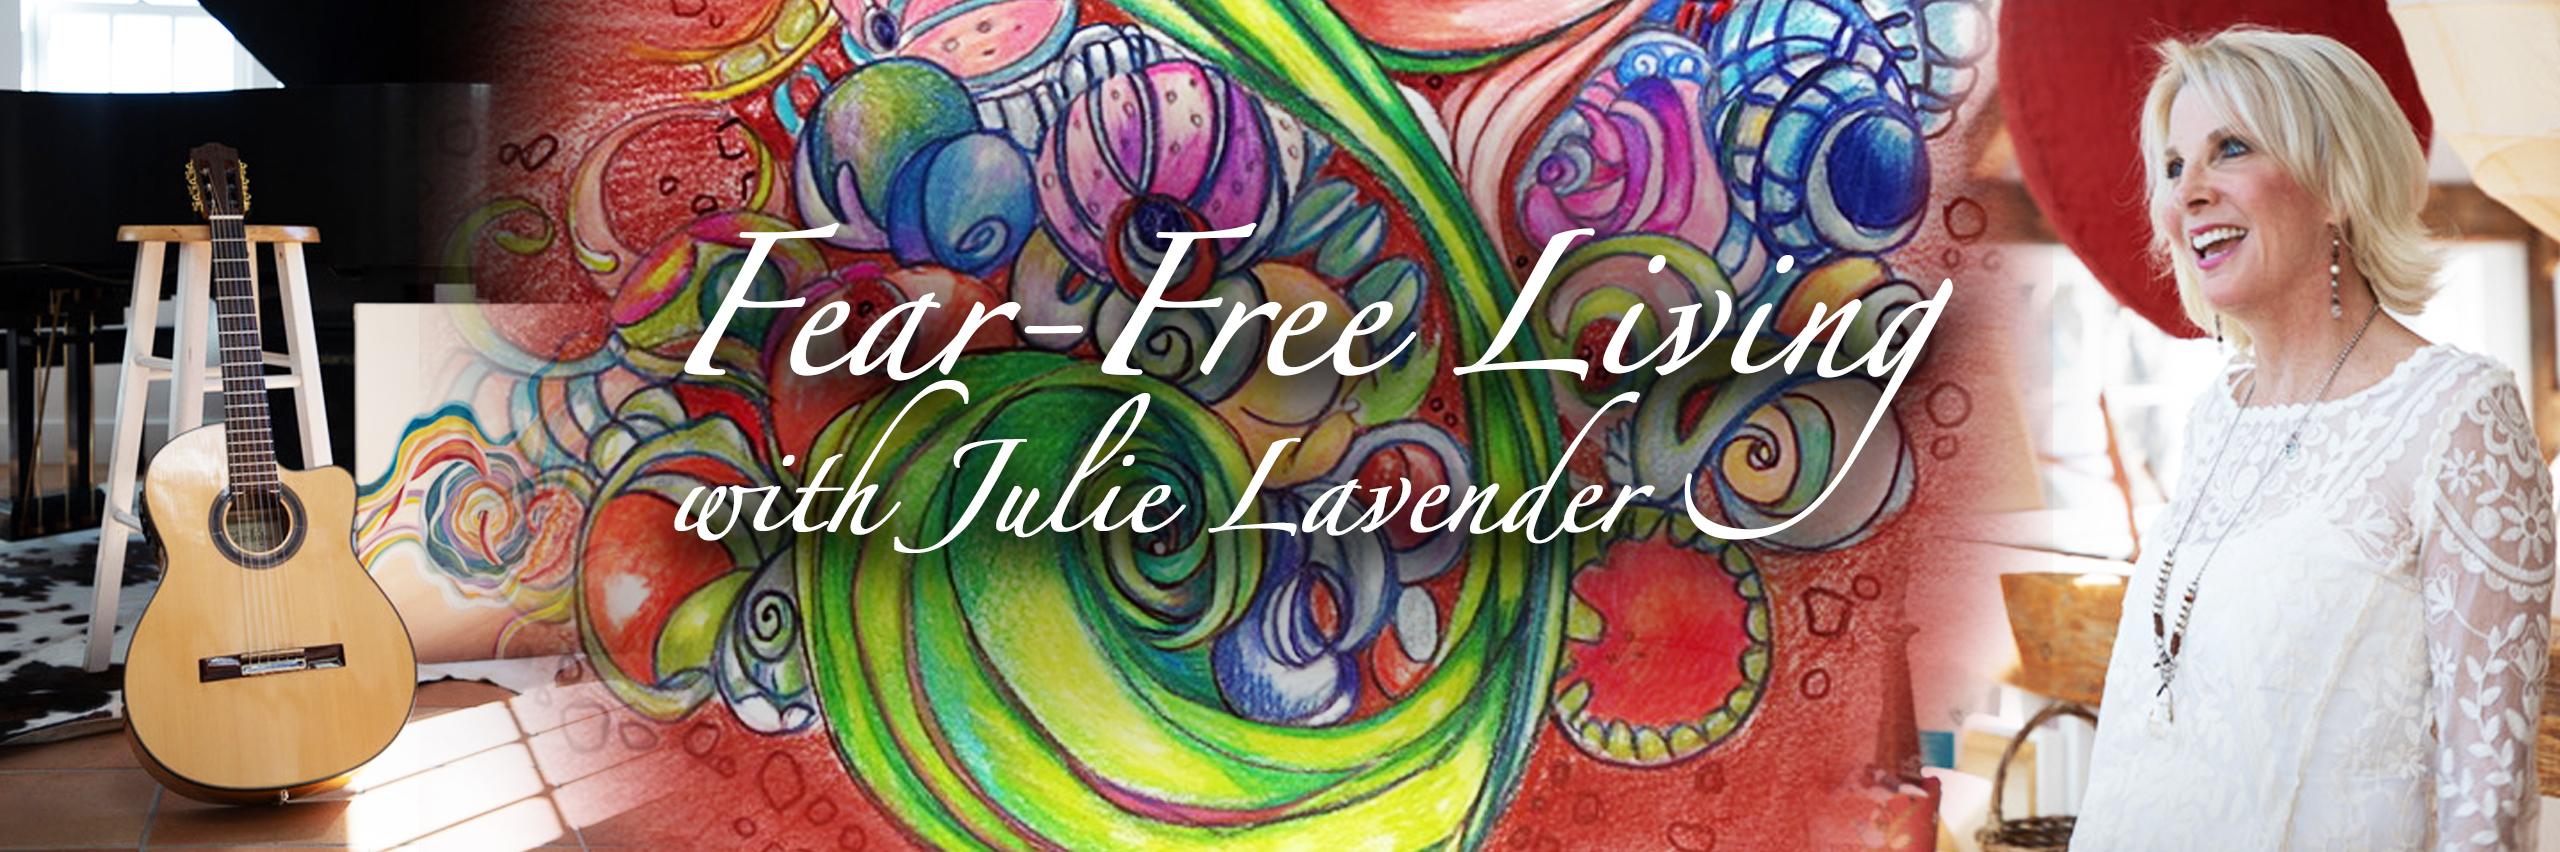 fear-free_living_header2